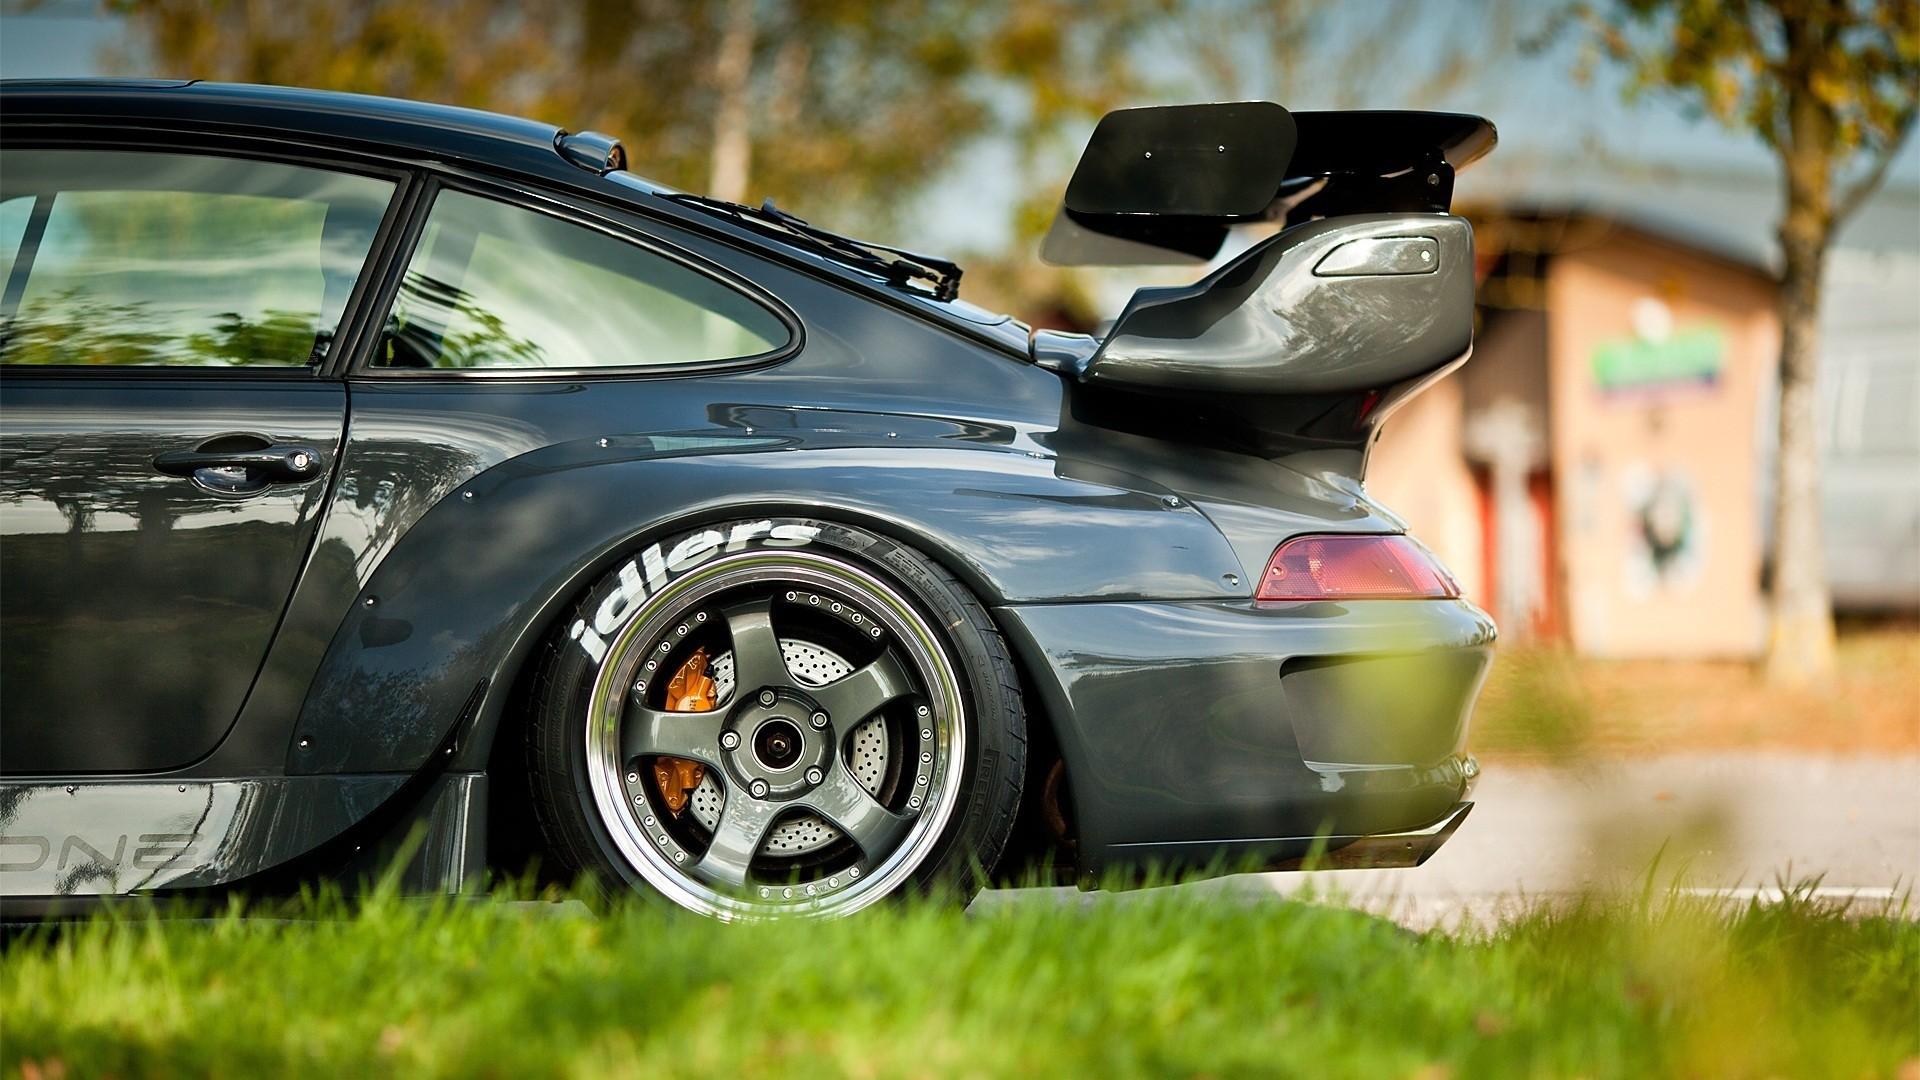 Porsche Euro Tuning Porsche 911 Rauh Welt Begriff Rwb Porsche 930 Wallpaper 4k 1920x1080 Wallpaper Teahub Io